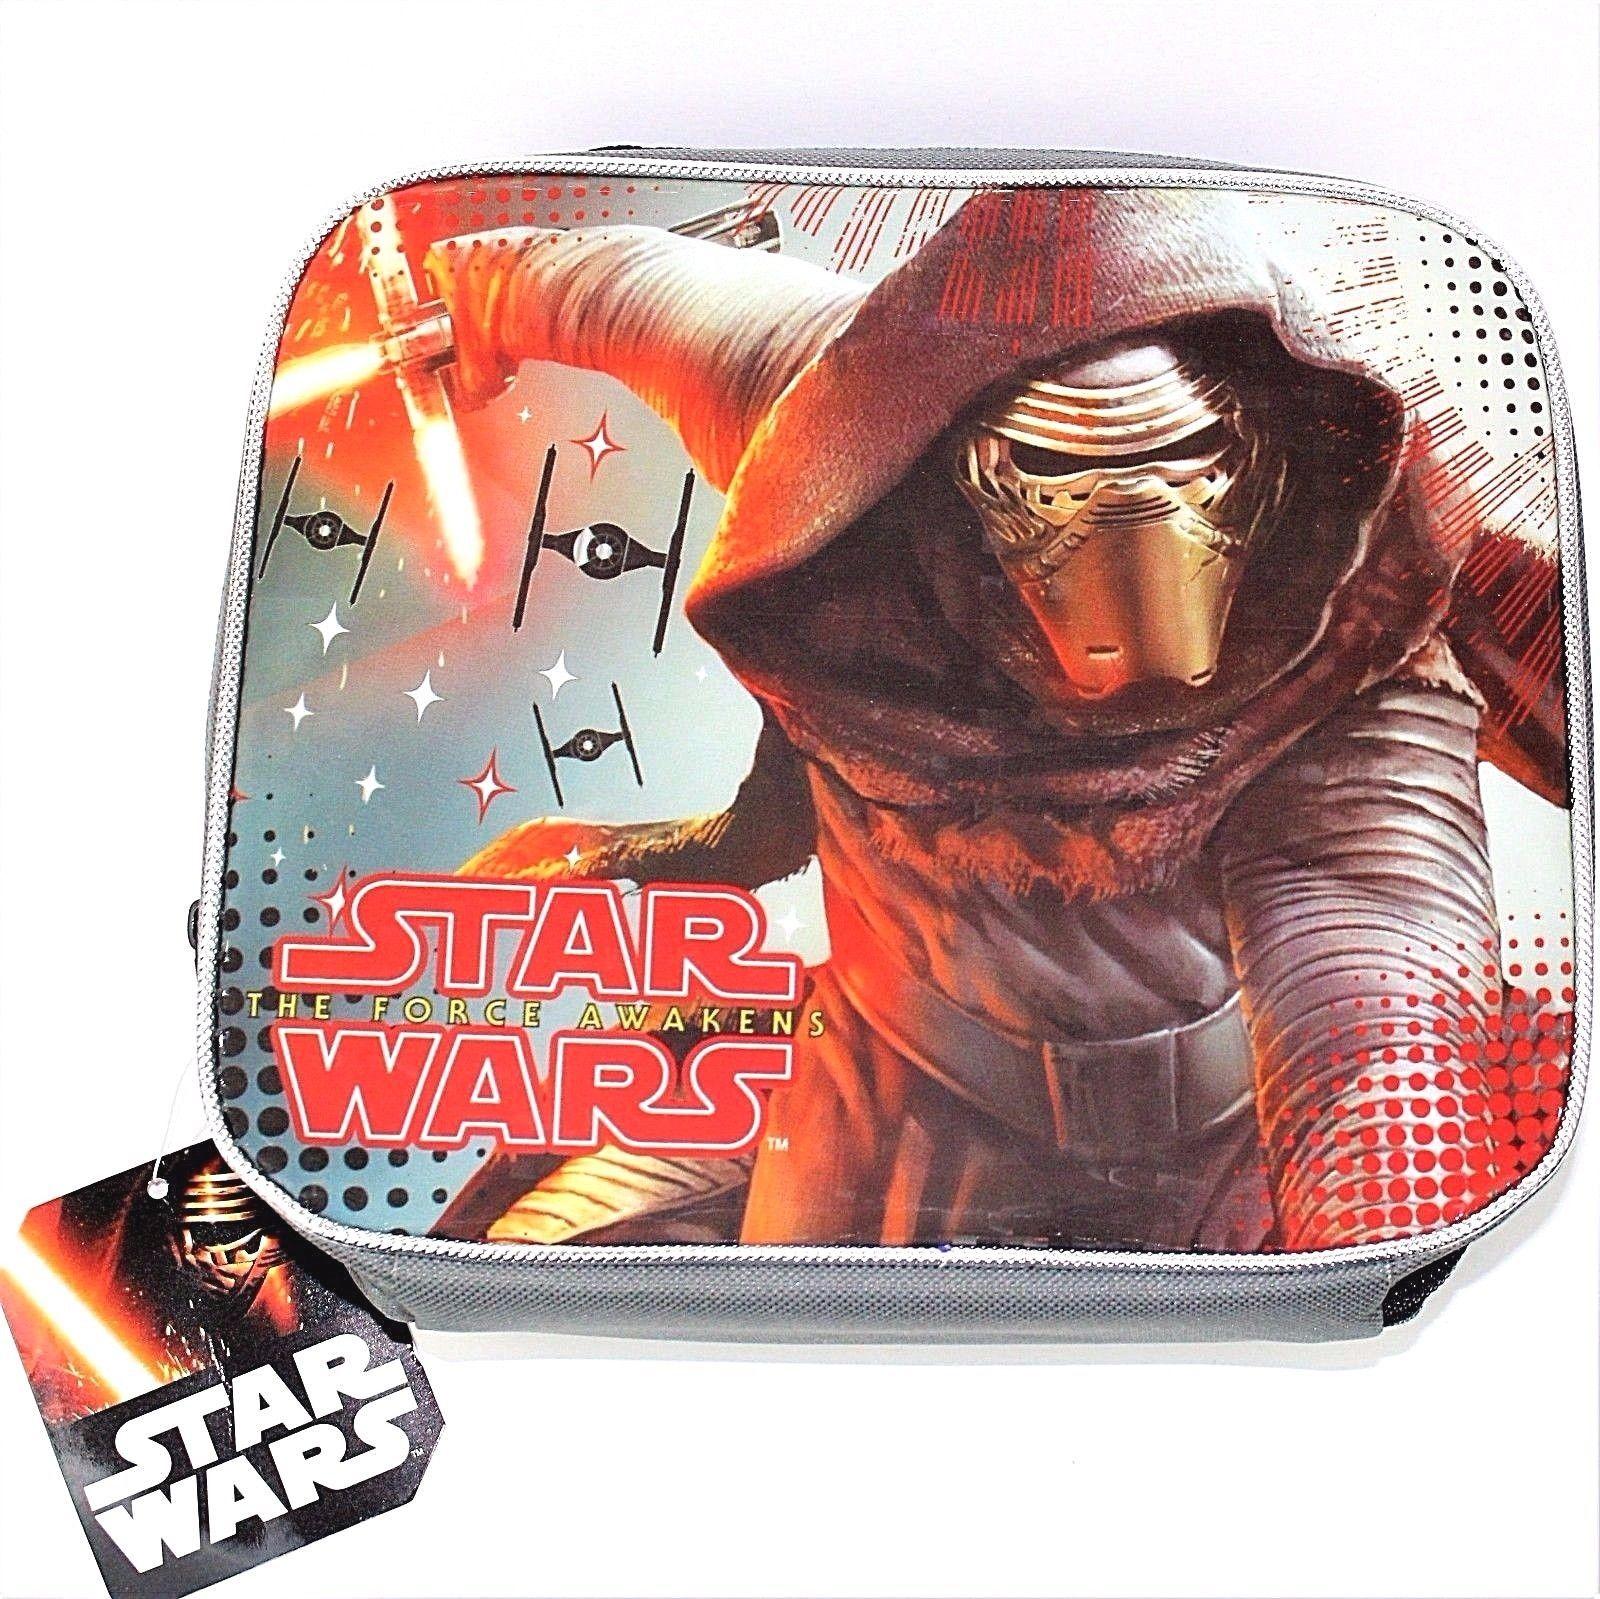 Disney Star Wars The Force Awakens Kylo Ren Ben Solo Insulated Lunch Bag